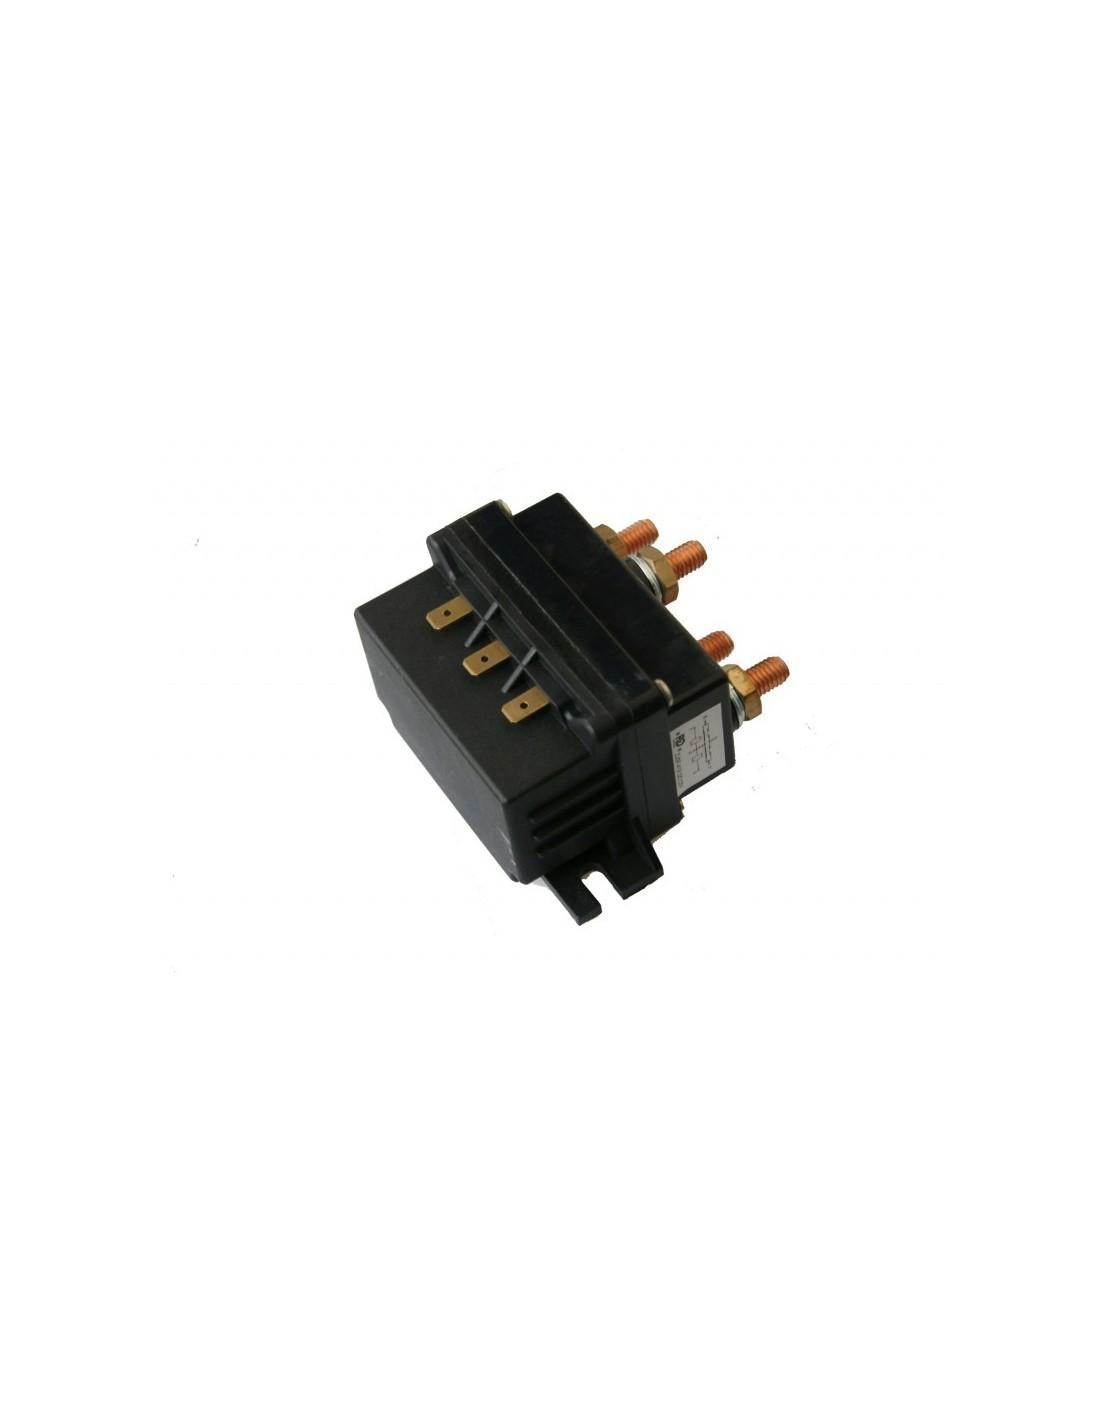 treuil electrique powerwinch 5900 kg 12v telecommande. Black Bedroom Furniture Sets. Home Design Ideas